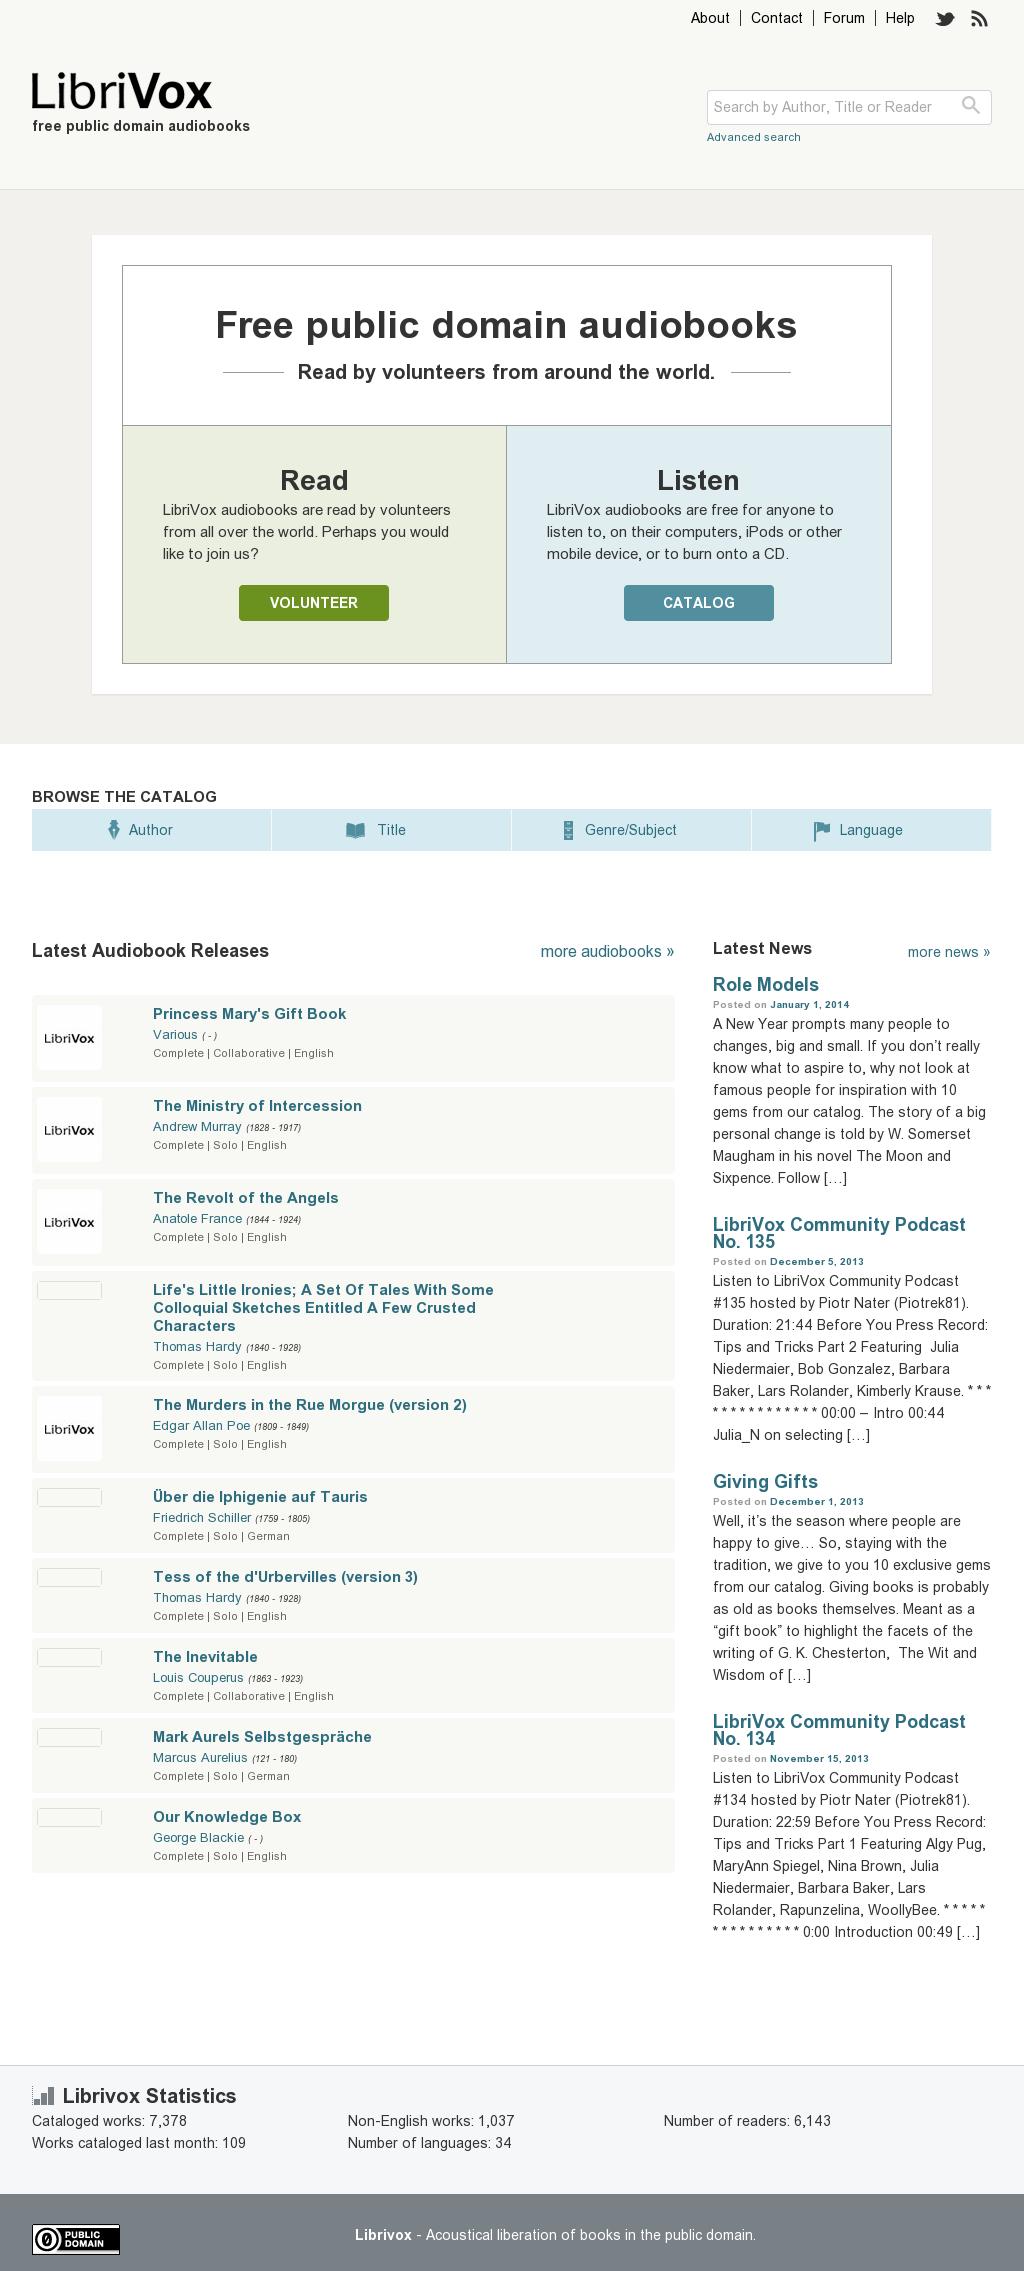 LibriVox - Free Public Domain Audiobooks